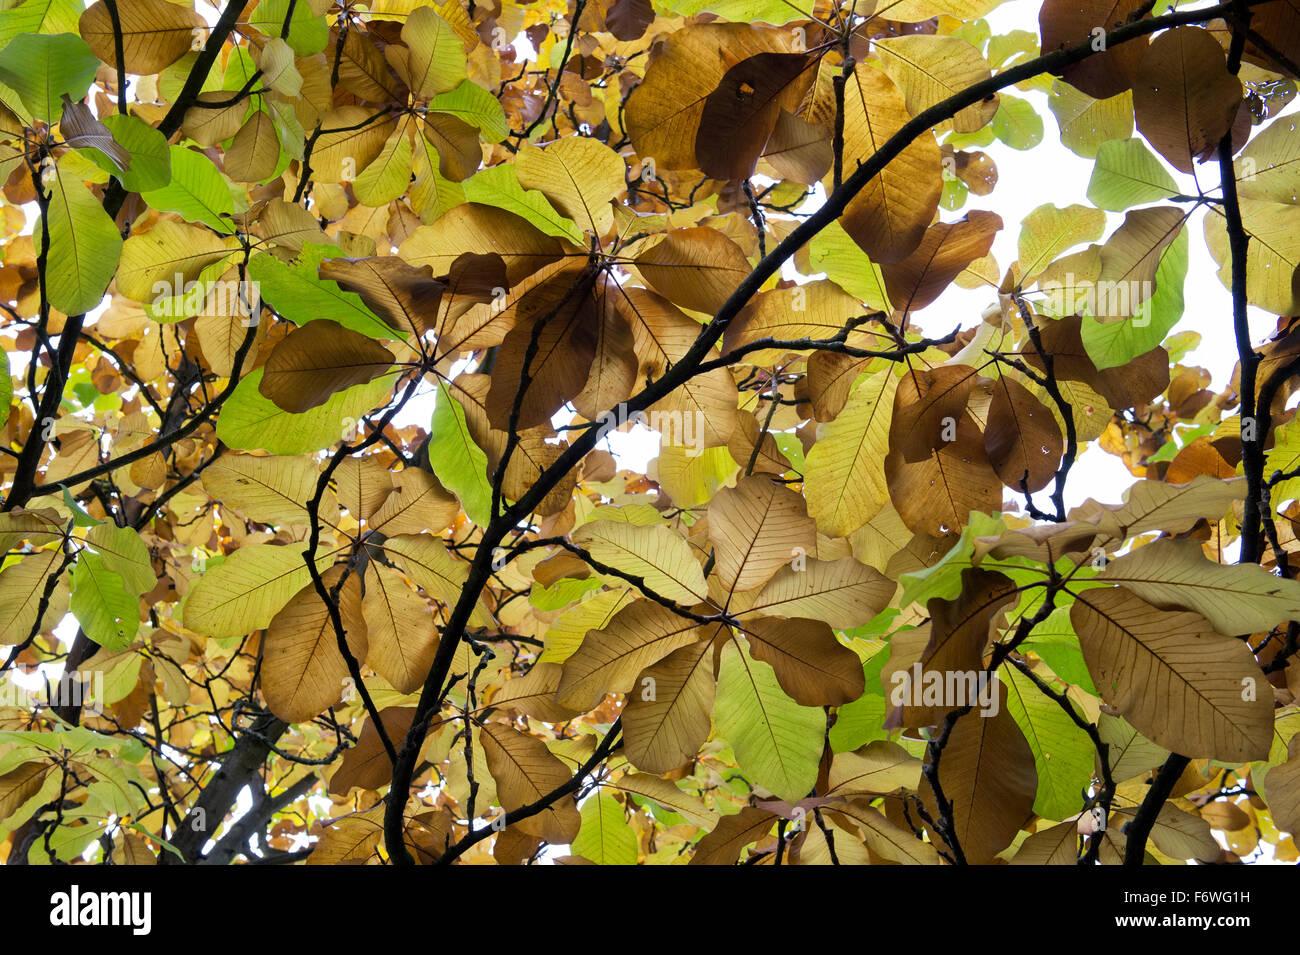 Magnolia Leaves Stock Photos Magnolia Leaves Stock Images Alamy